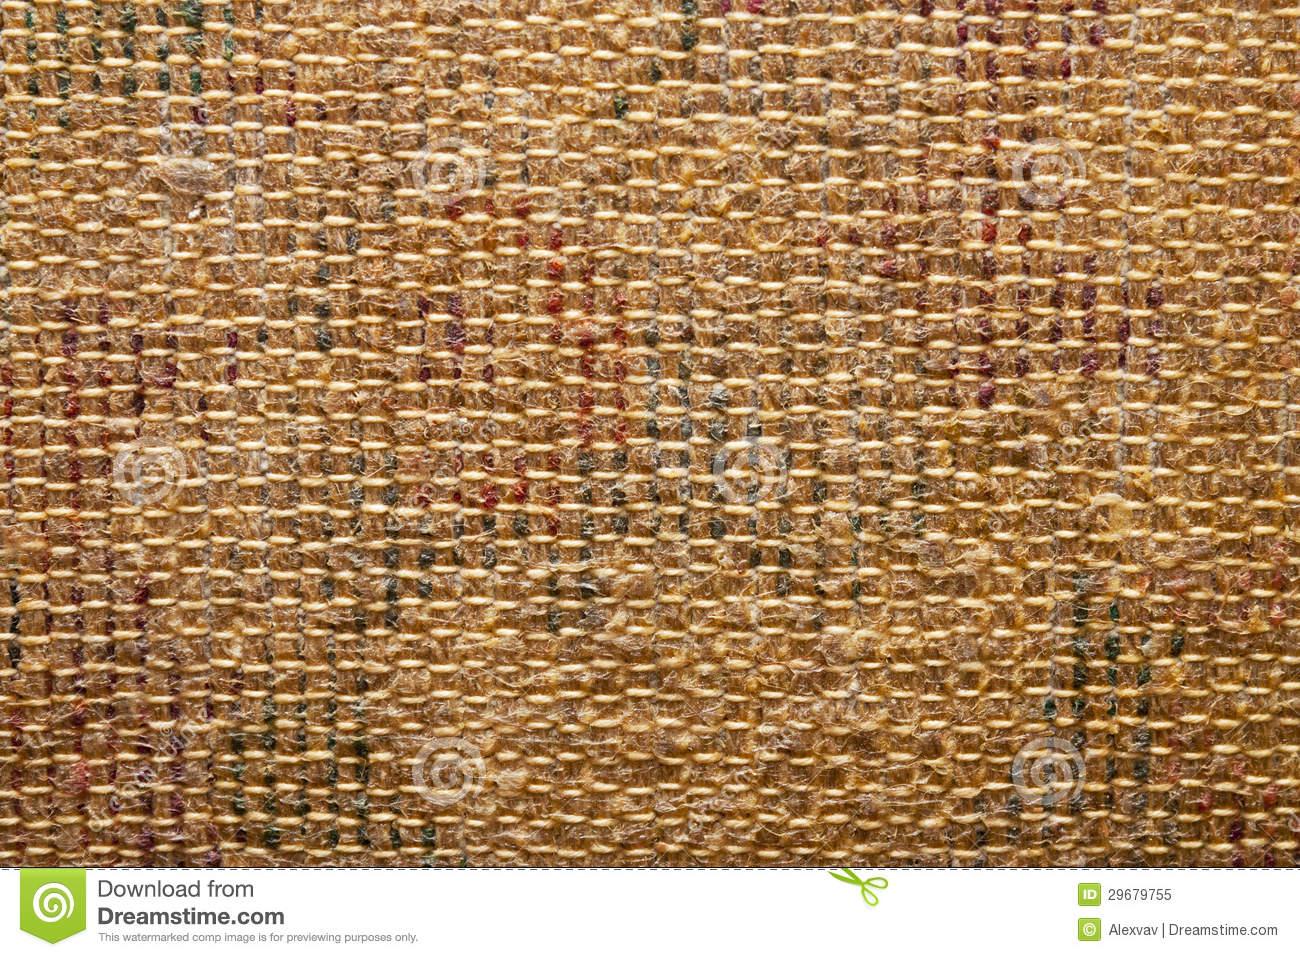 Coarse Fabric Texture Royalty Free Stock Photo.